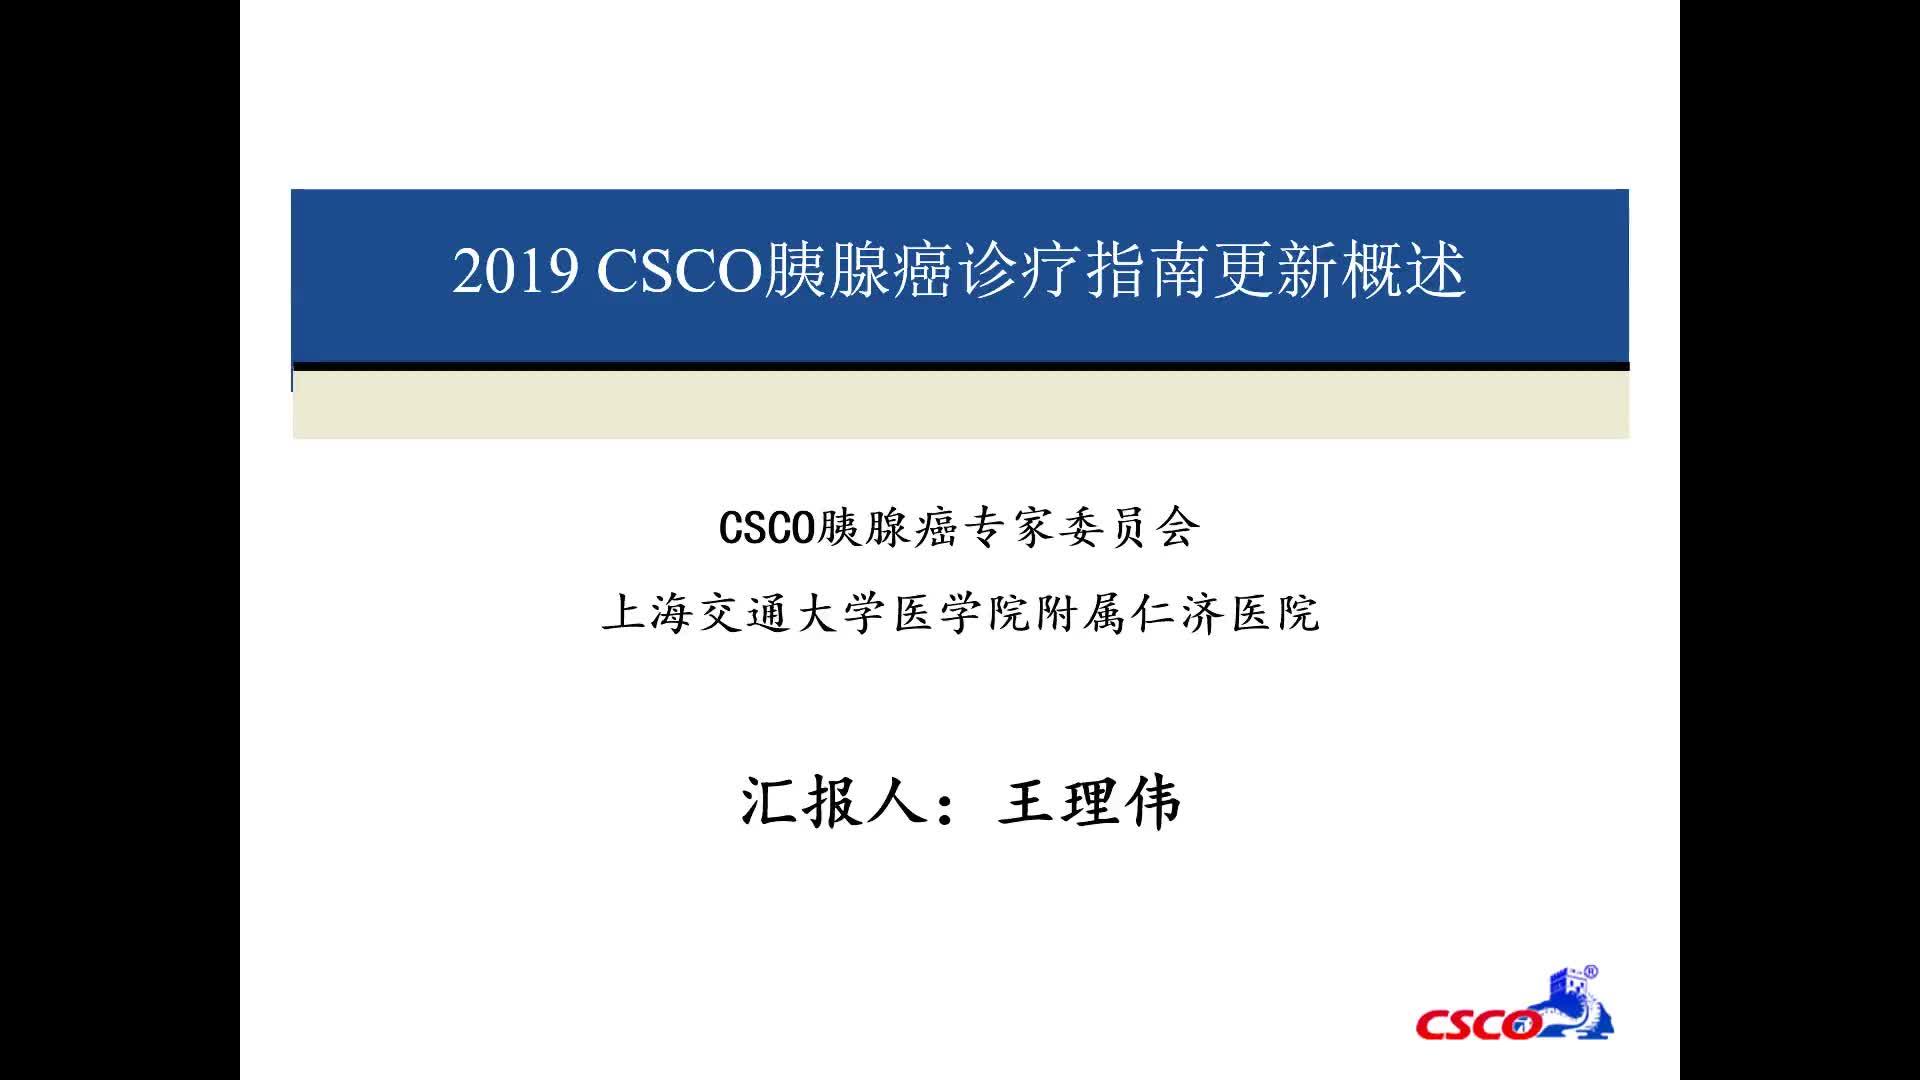 2019 CSCO胰腺癌诊疗指南更新概述